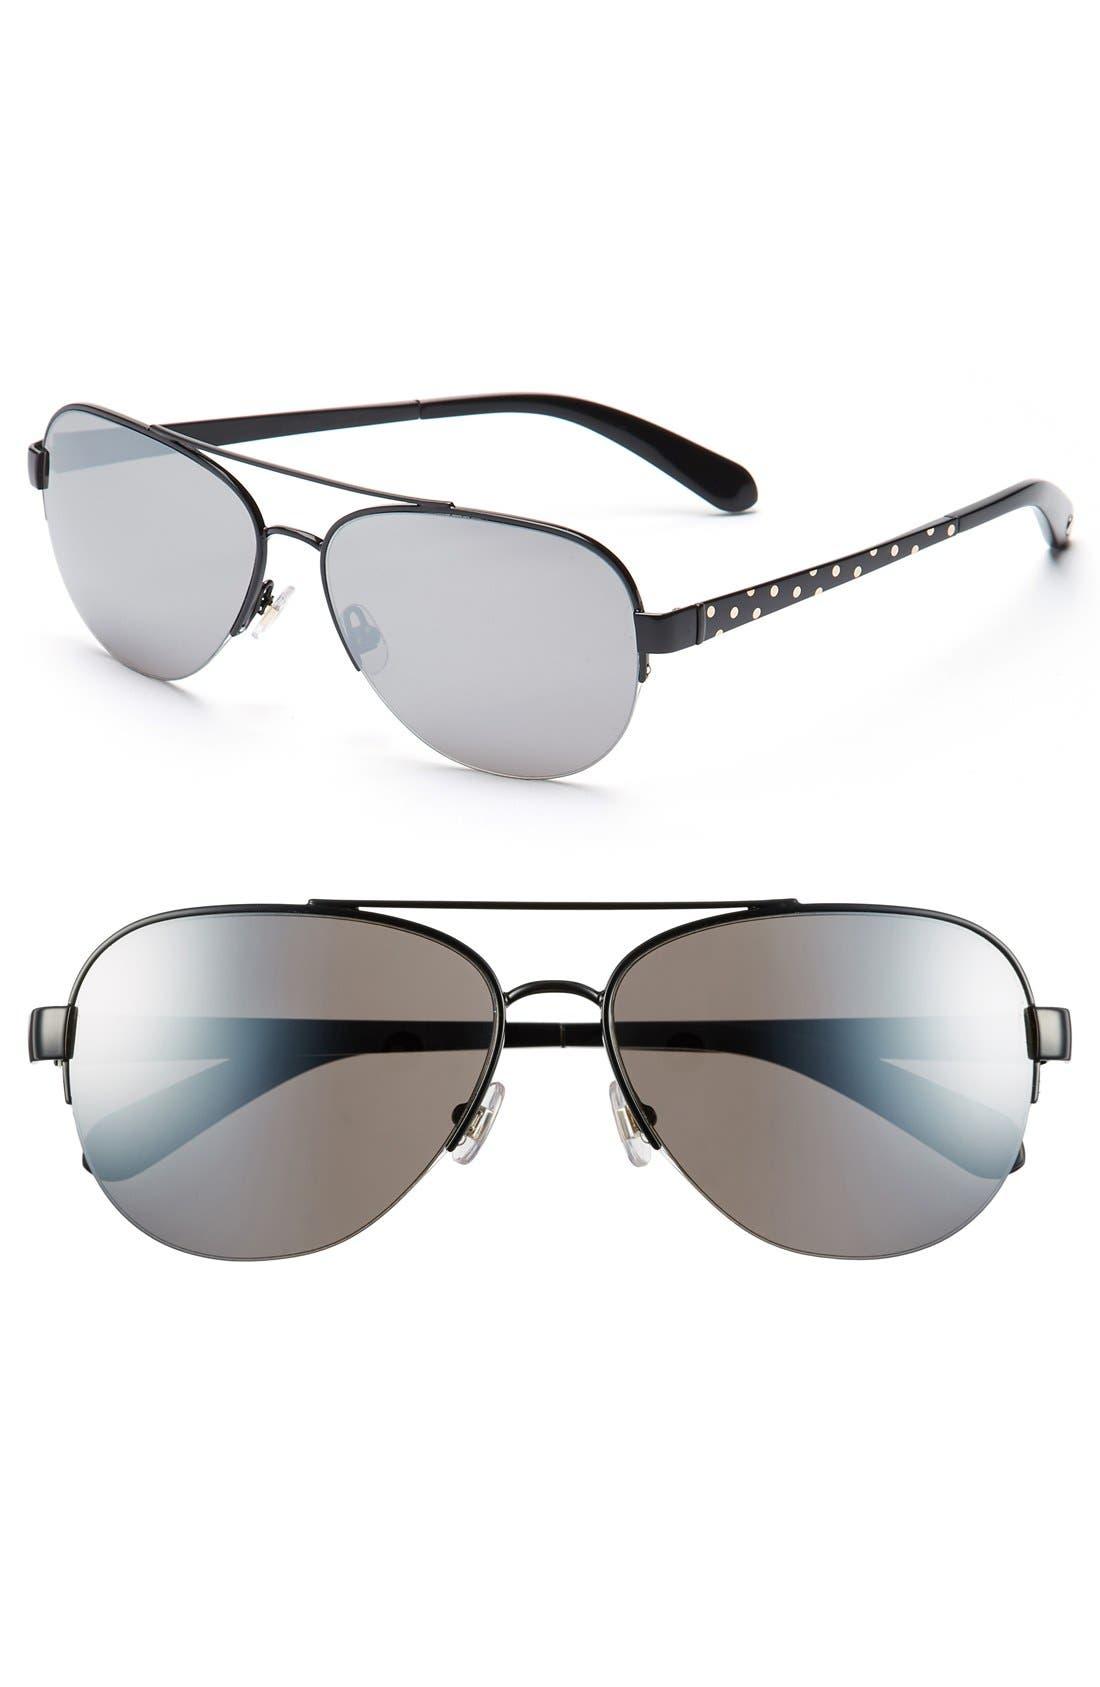 Main Image - kate spade new york 57mm aviator sunglasses